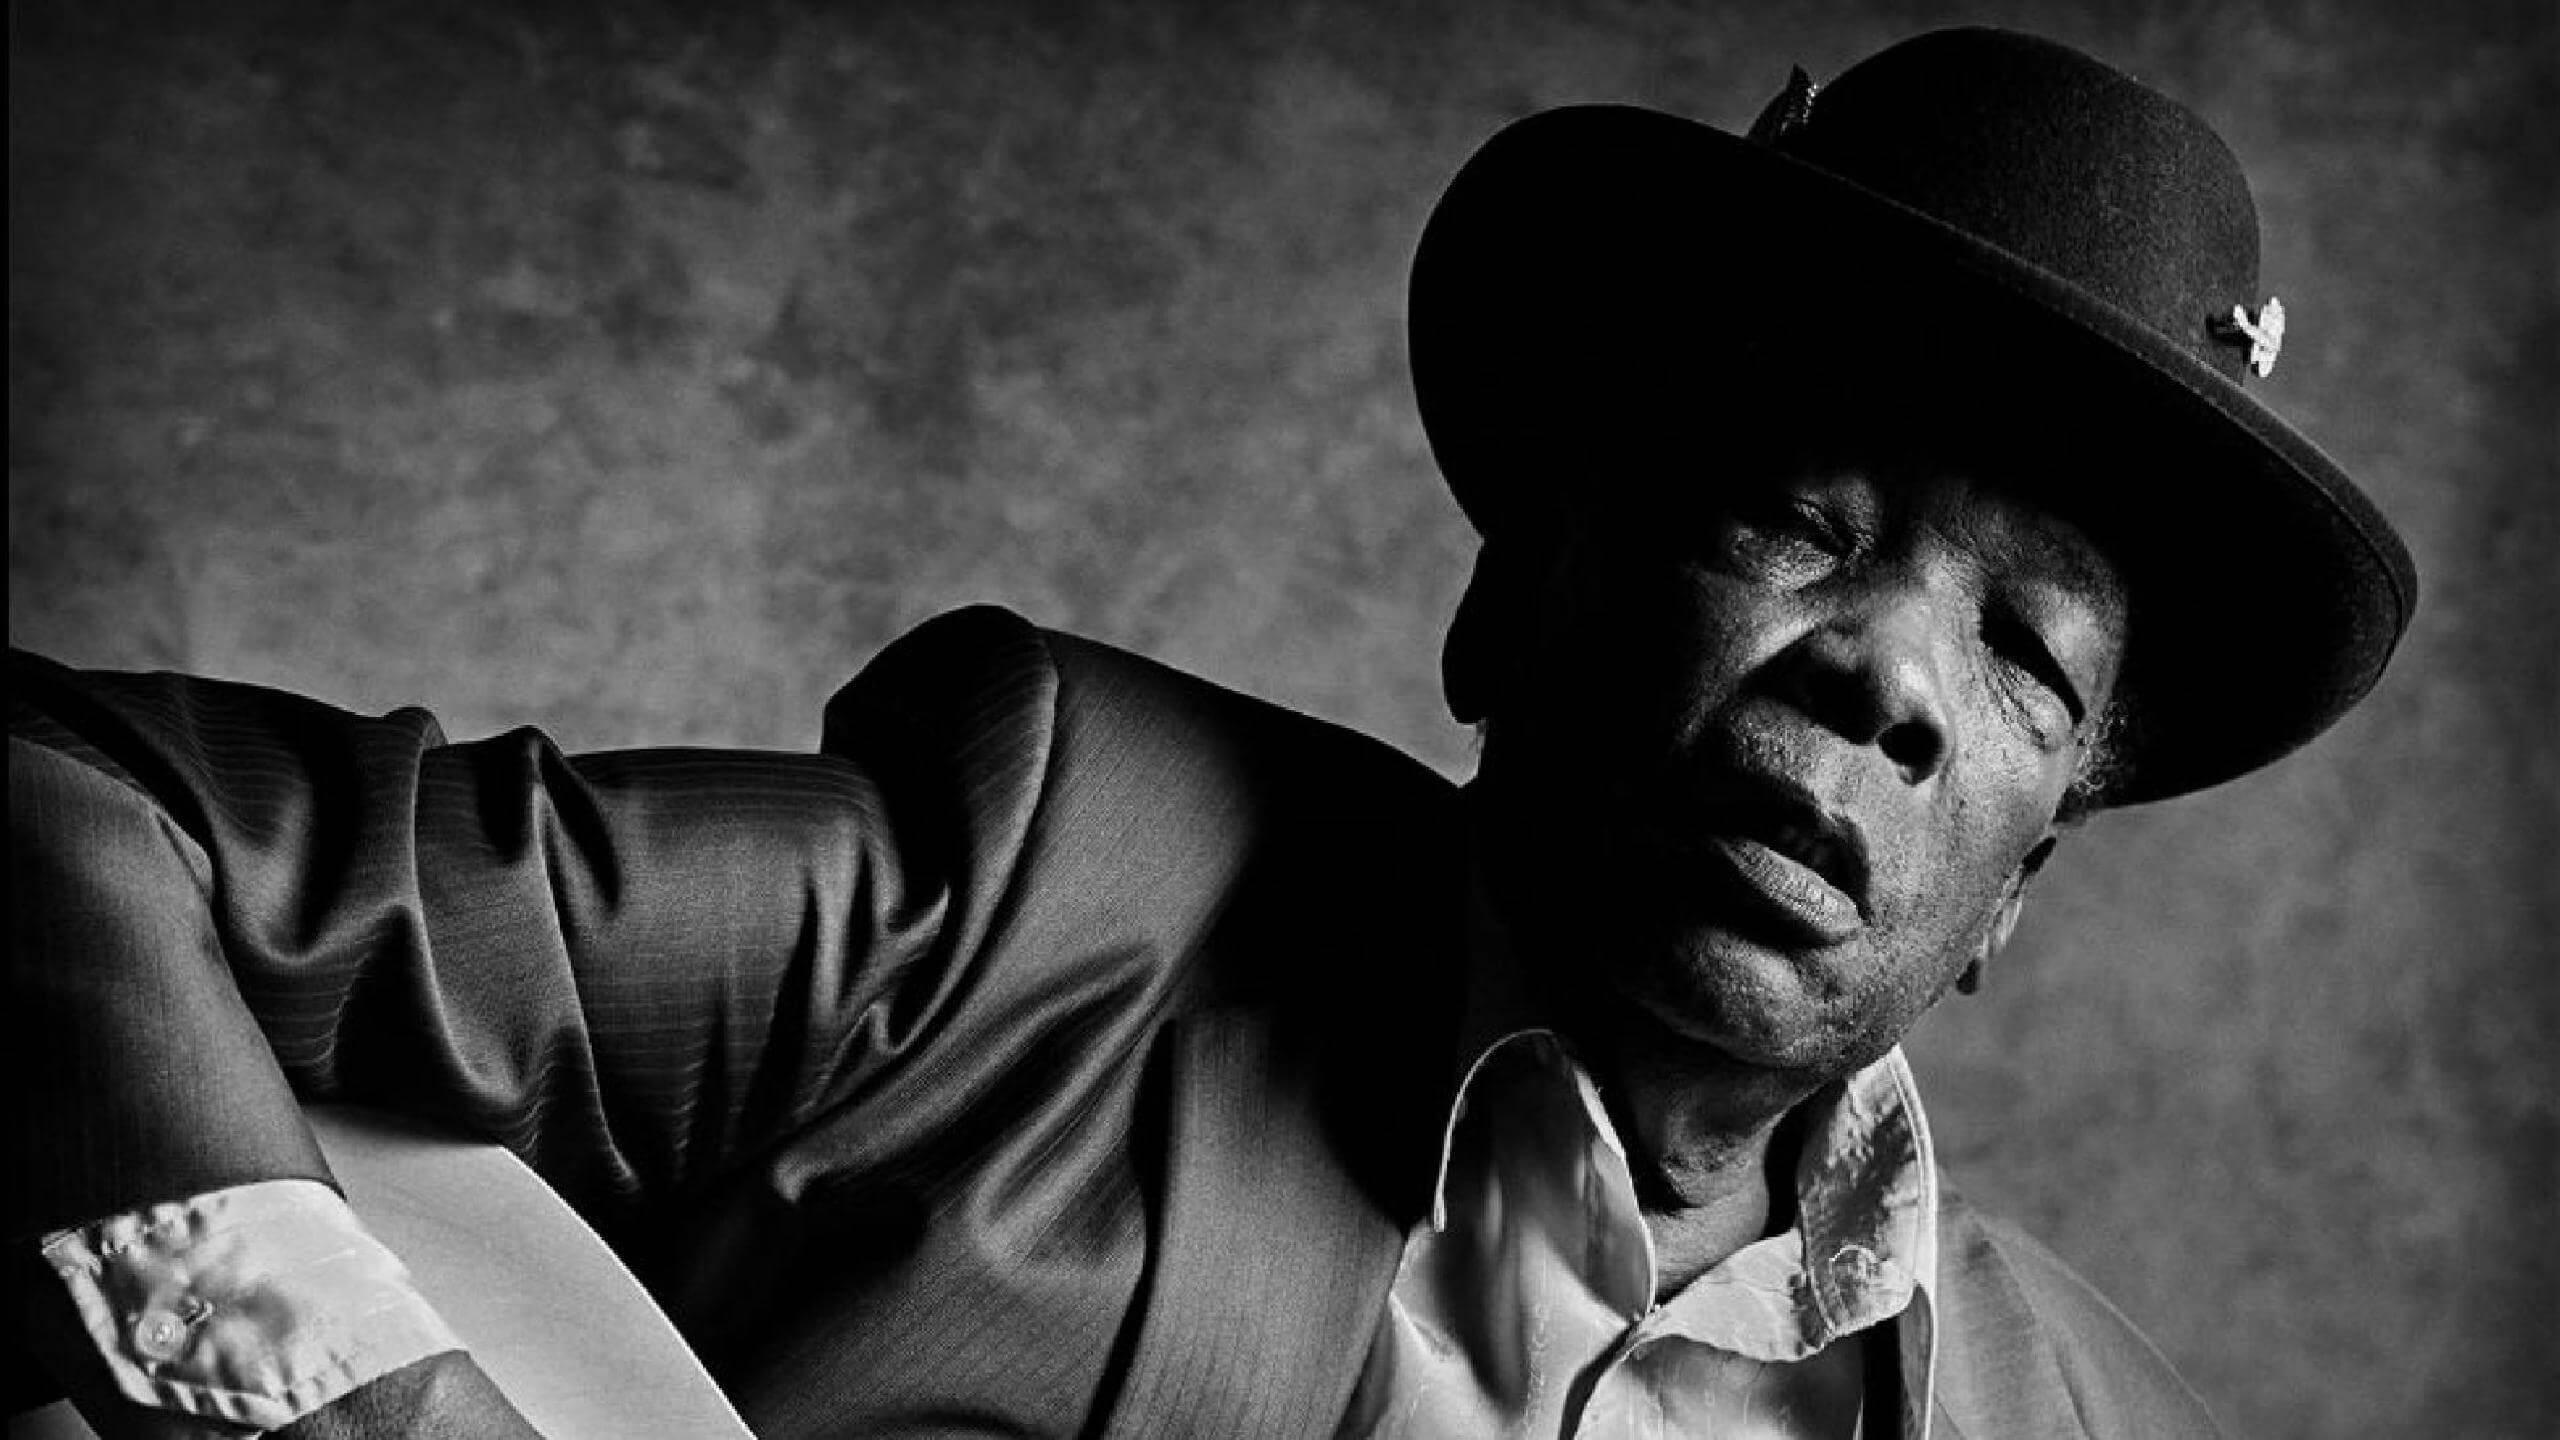 John Lee Hooker  meilleur guitariste blues